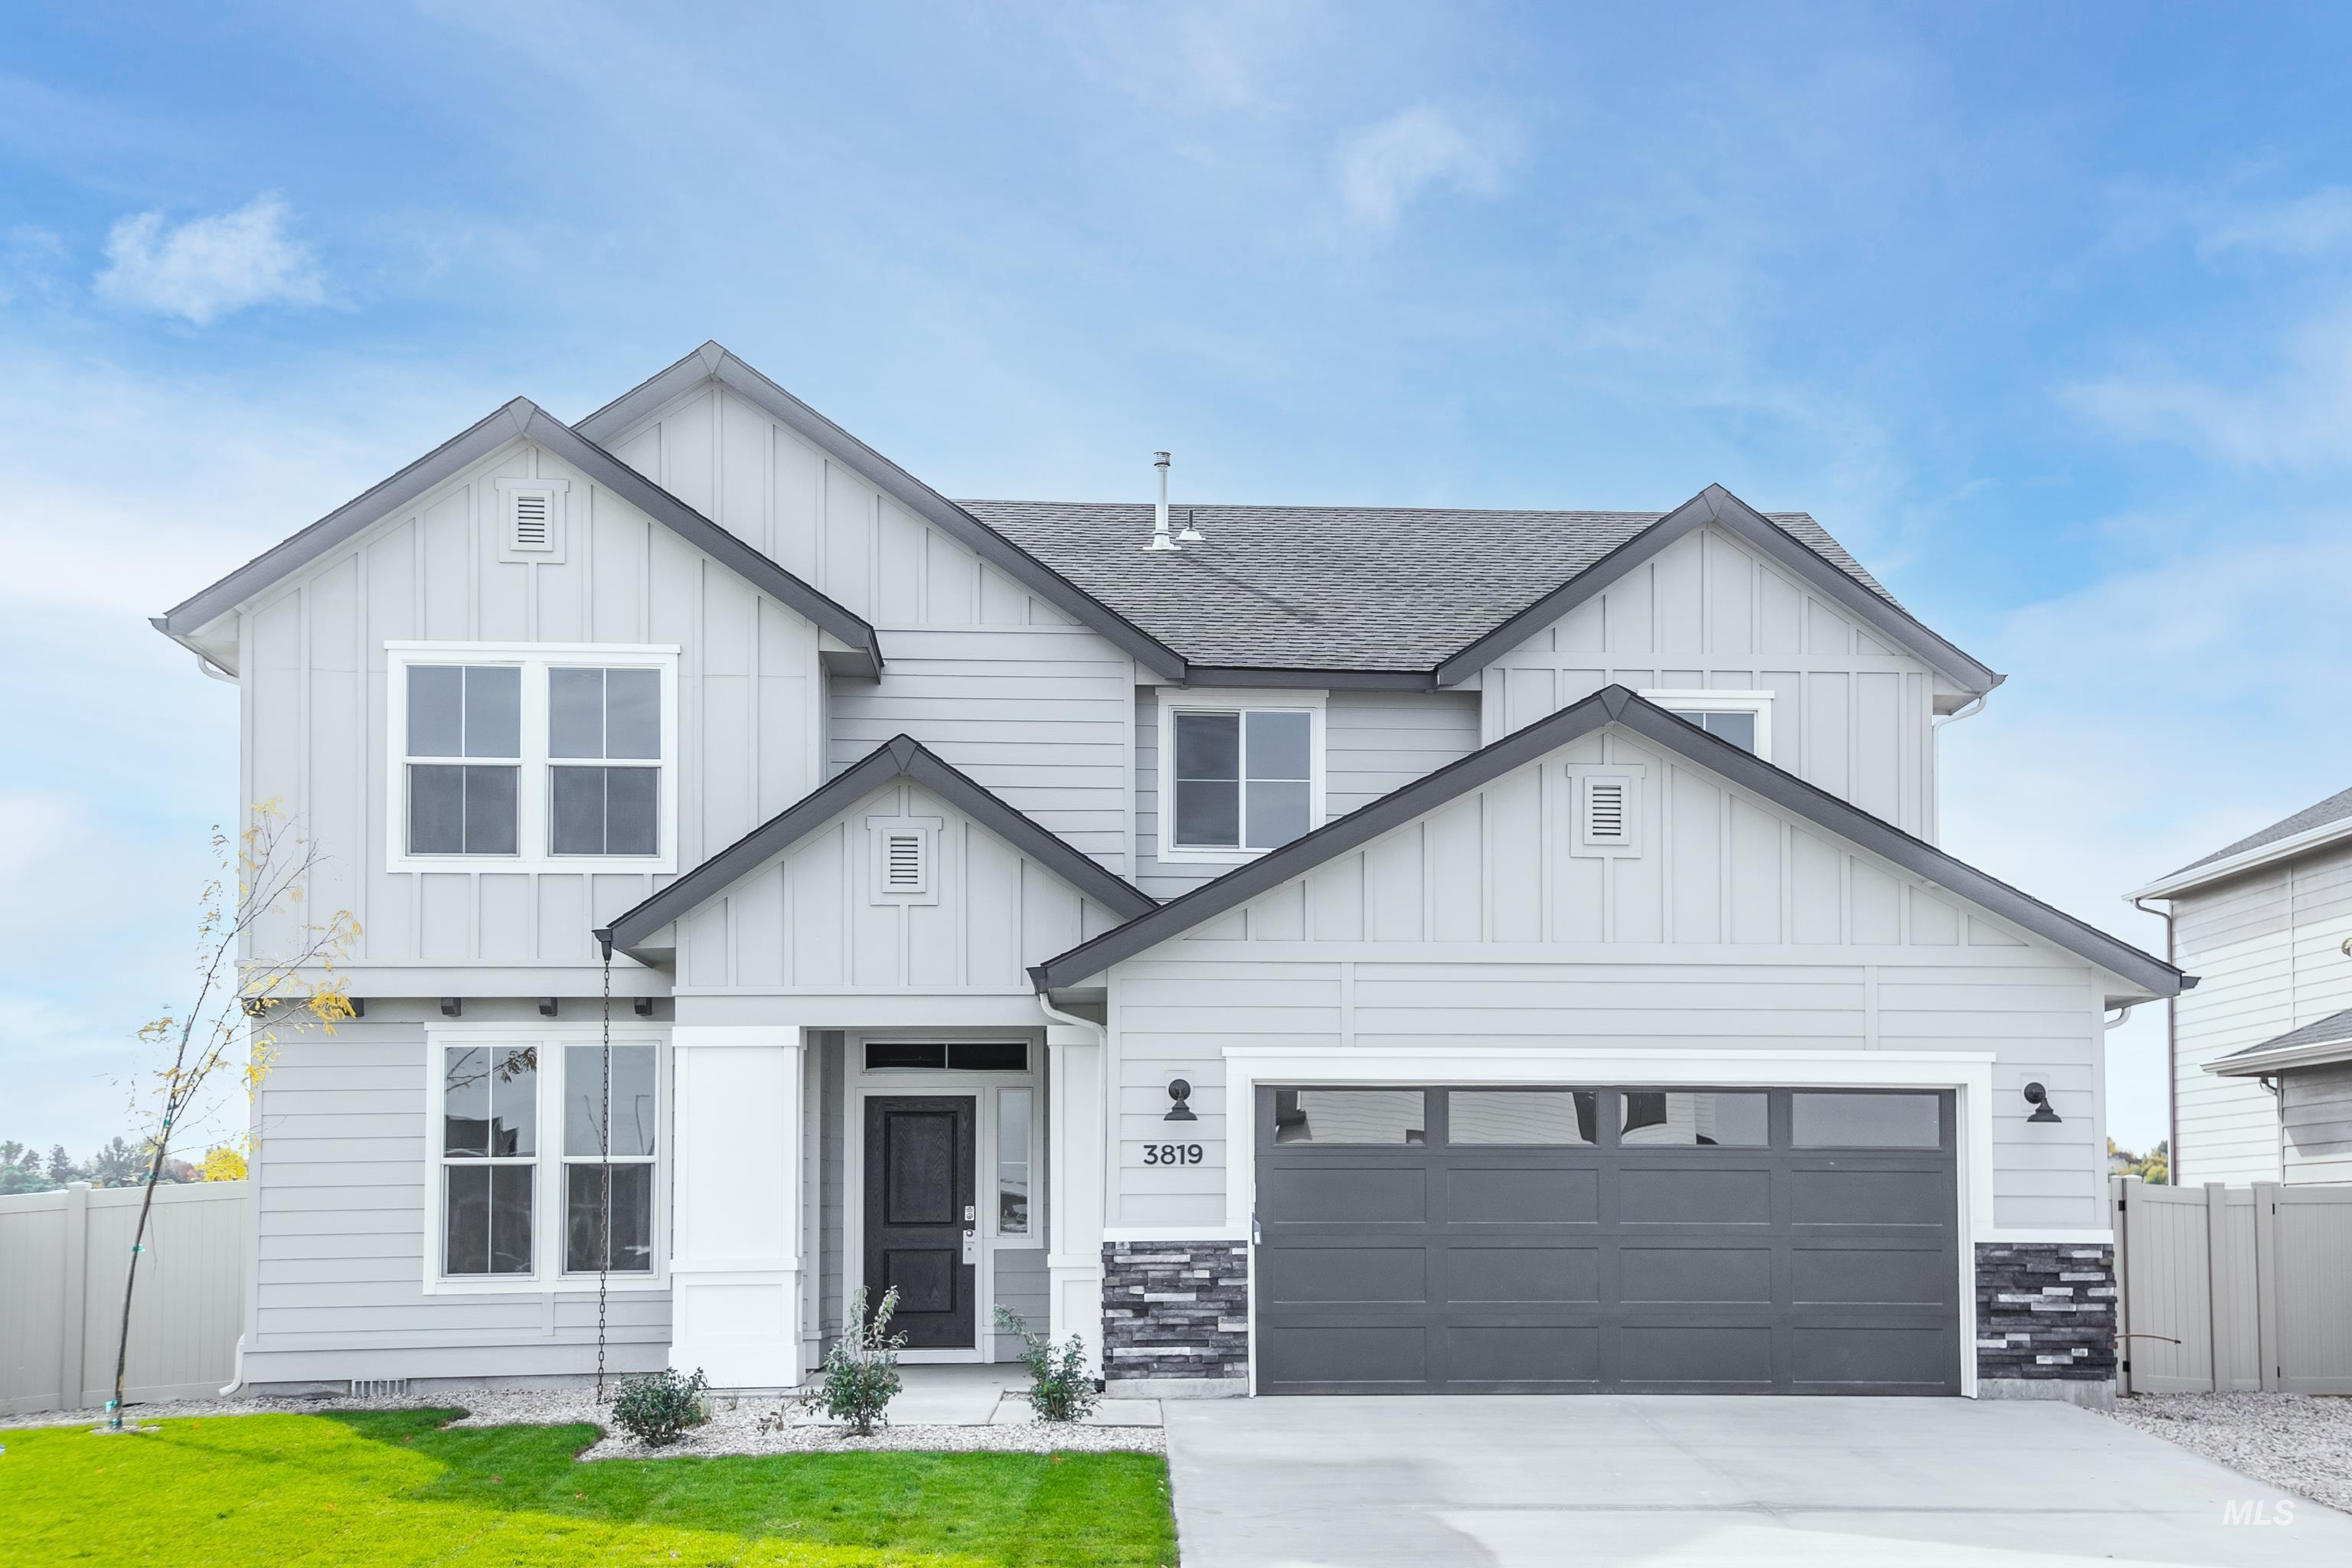 3819 W Cobalt St Property Photo